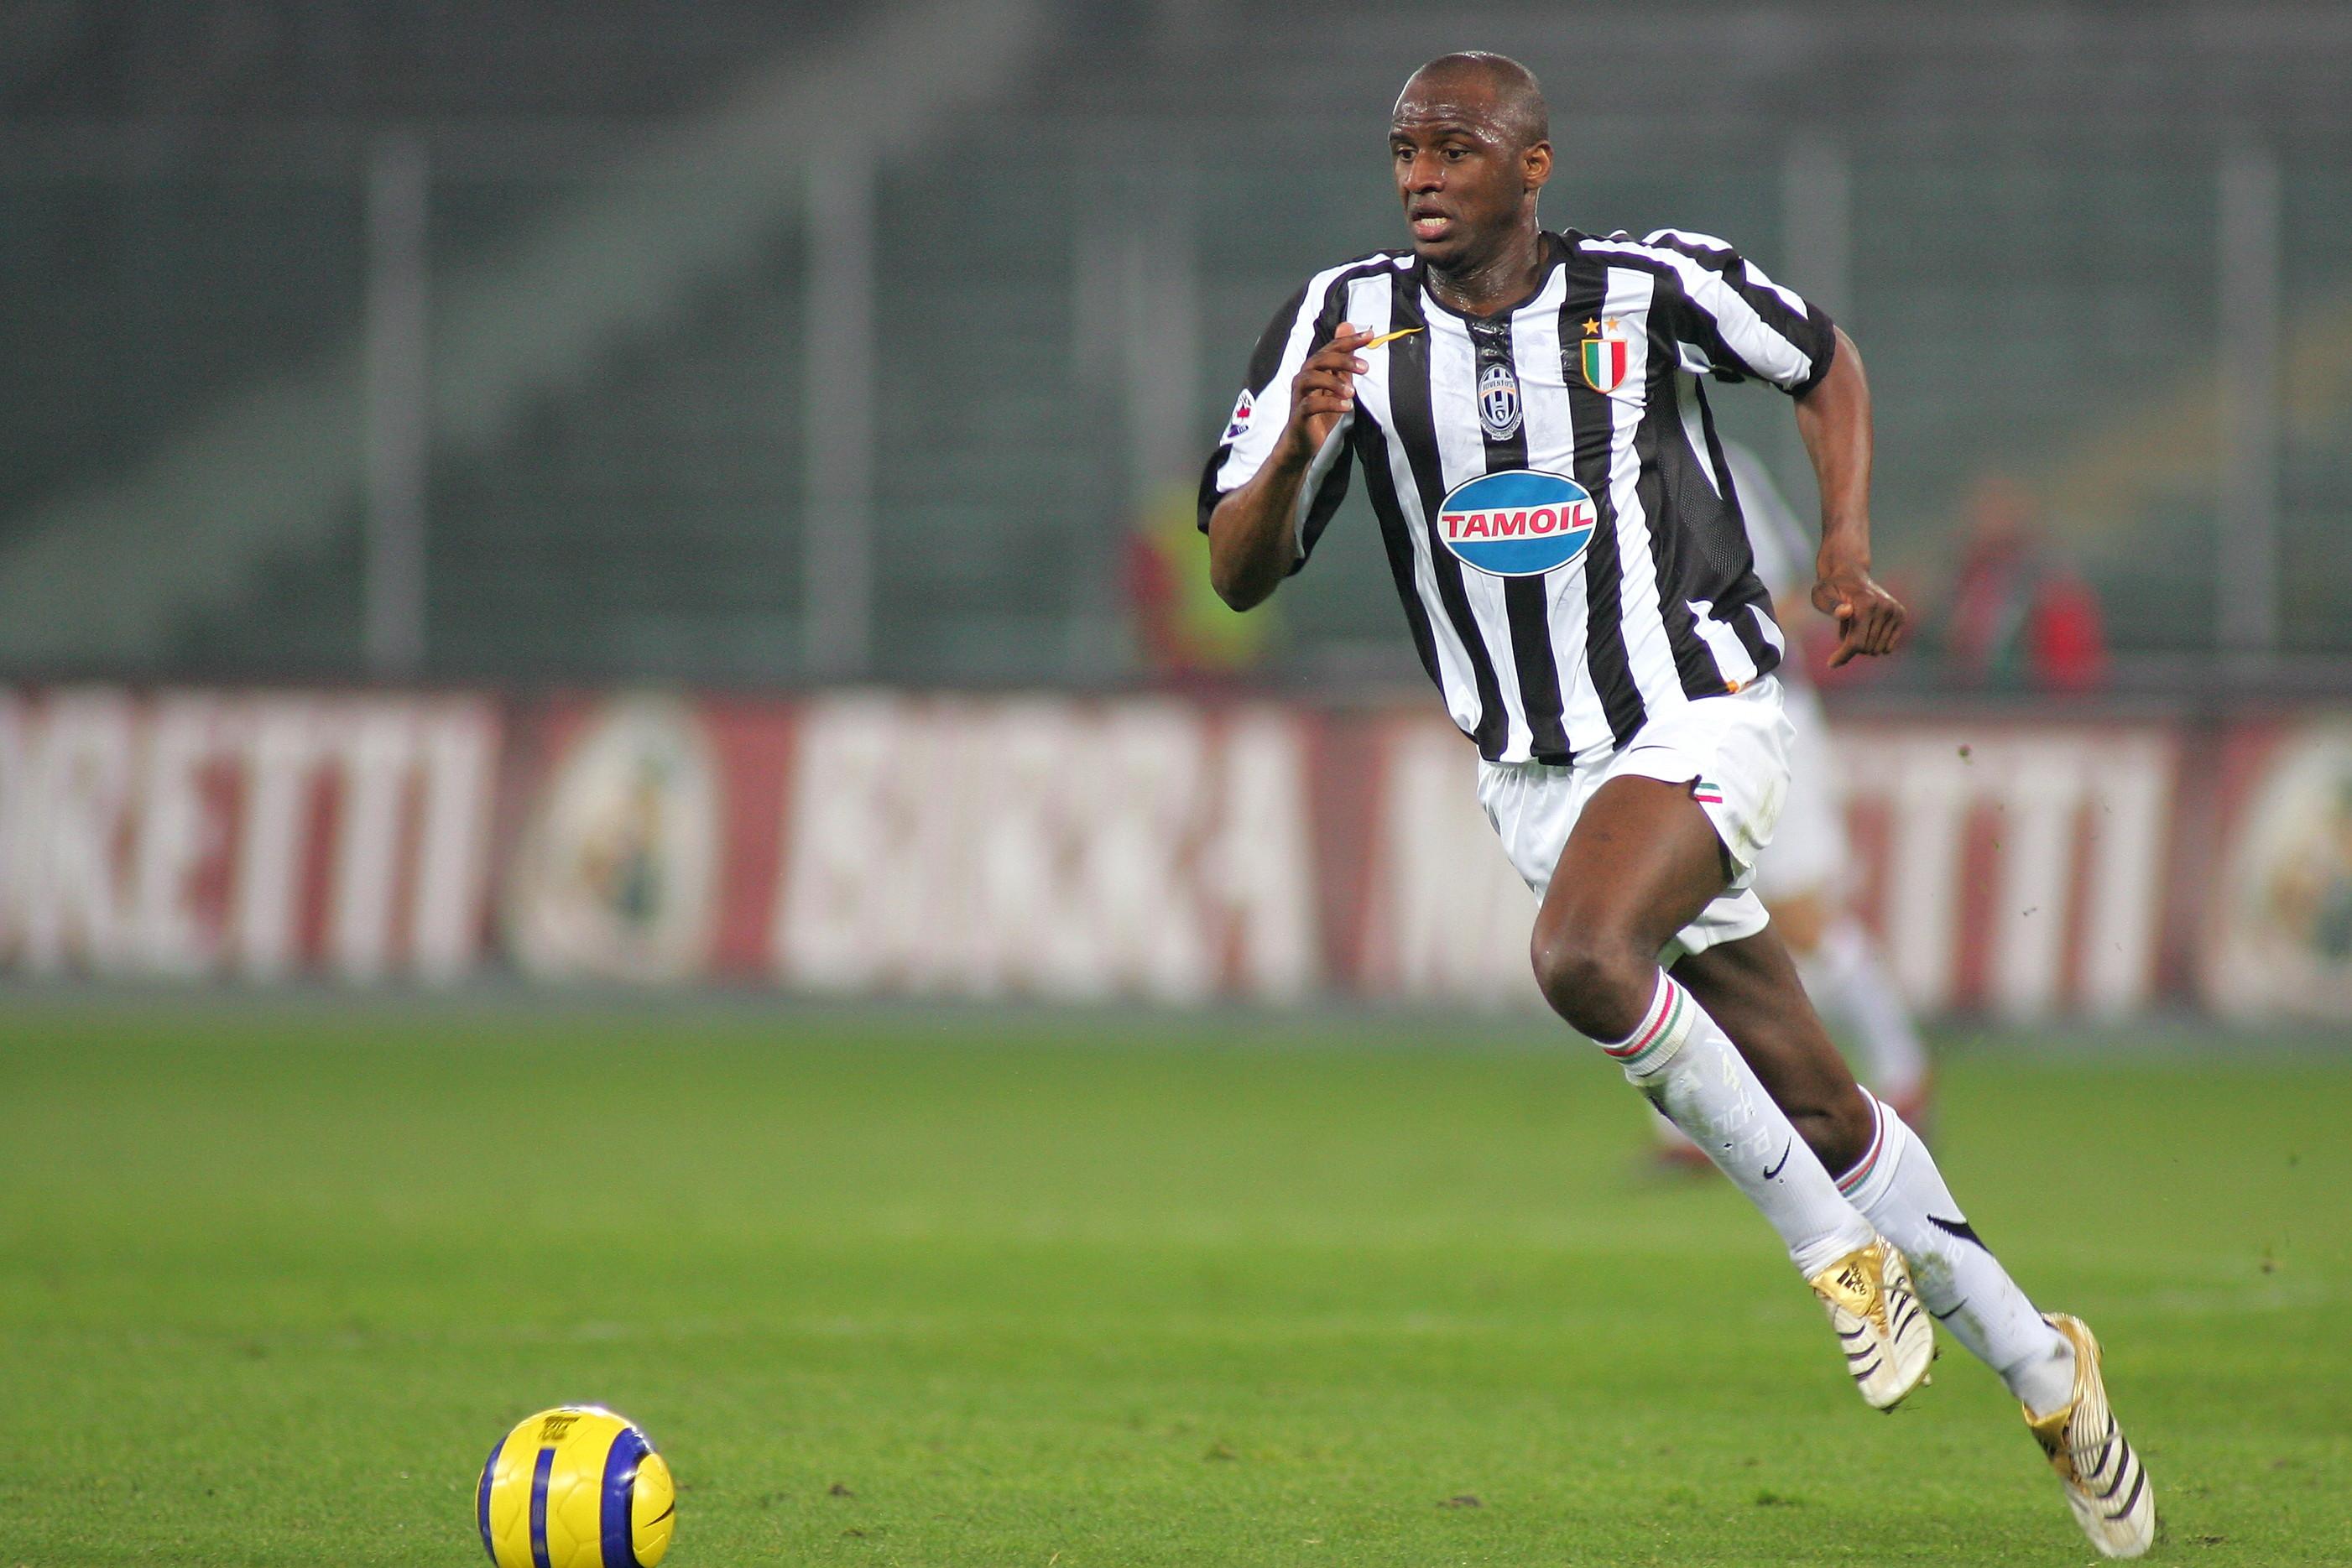 Patrice Vieira: Milan 1995.96, Juventus 2005-06